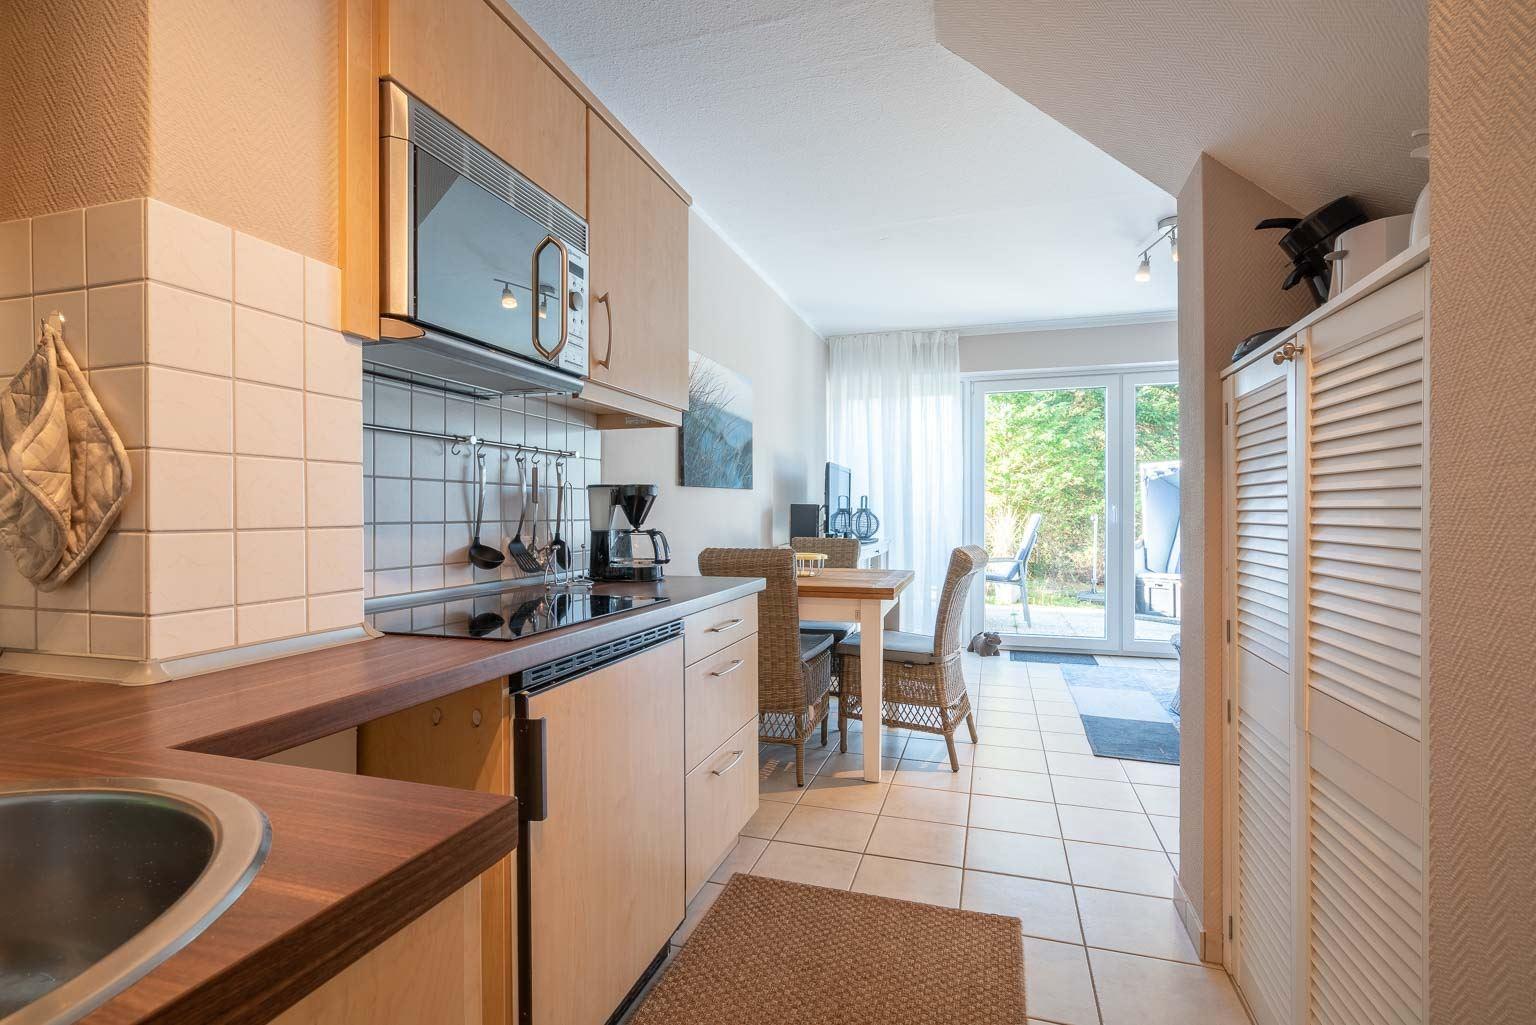 "Küche - St Peter Ording Dorf, Ferienhaus Groener Weg 9, Wohnung 1 ""Duenensonne EG"""